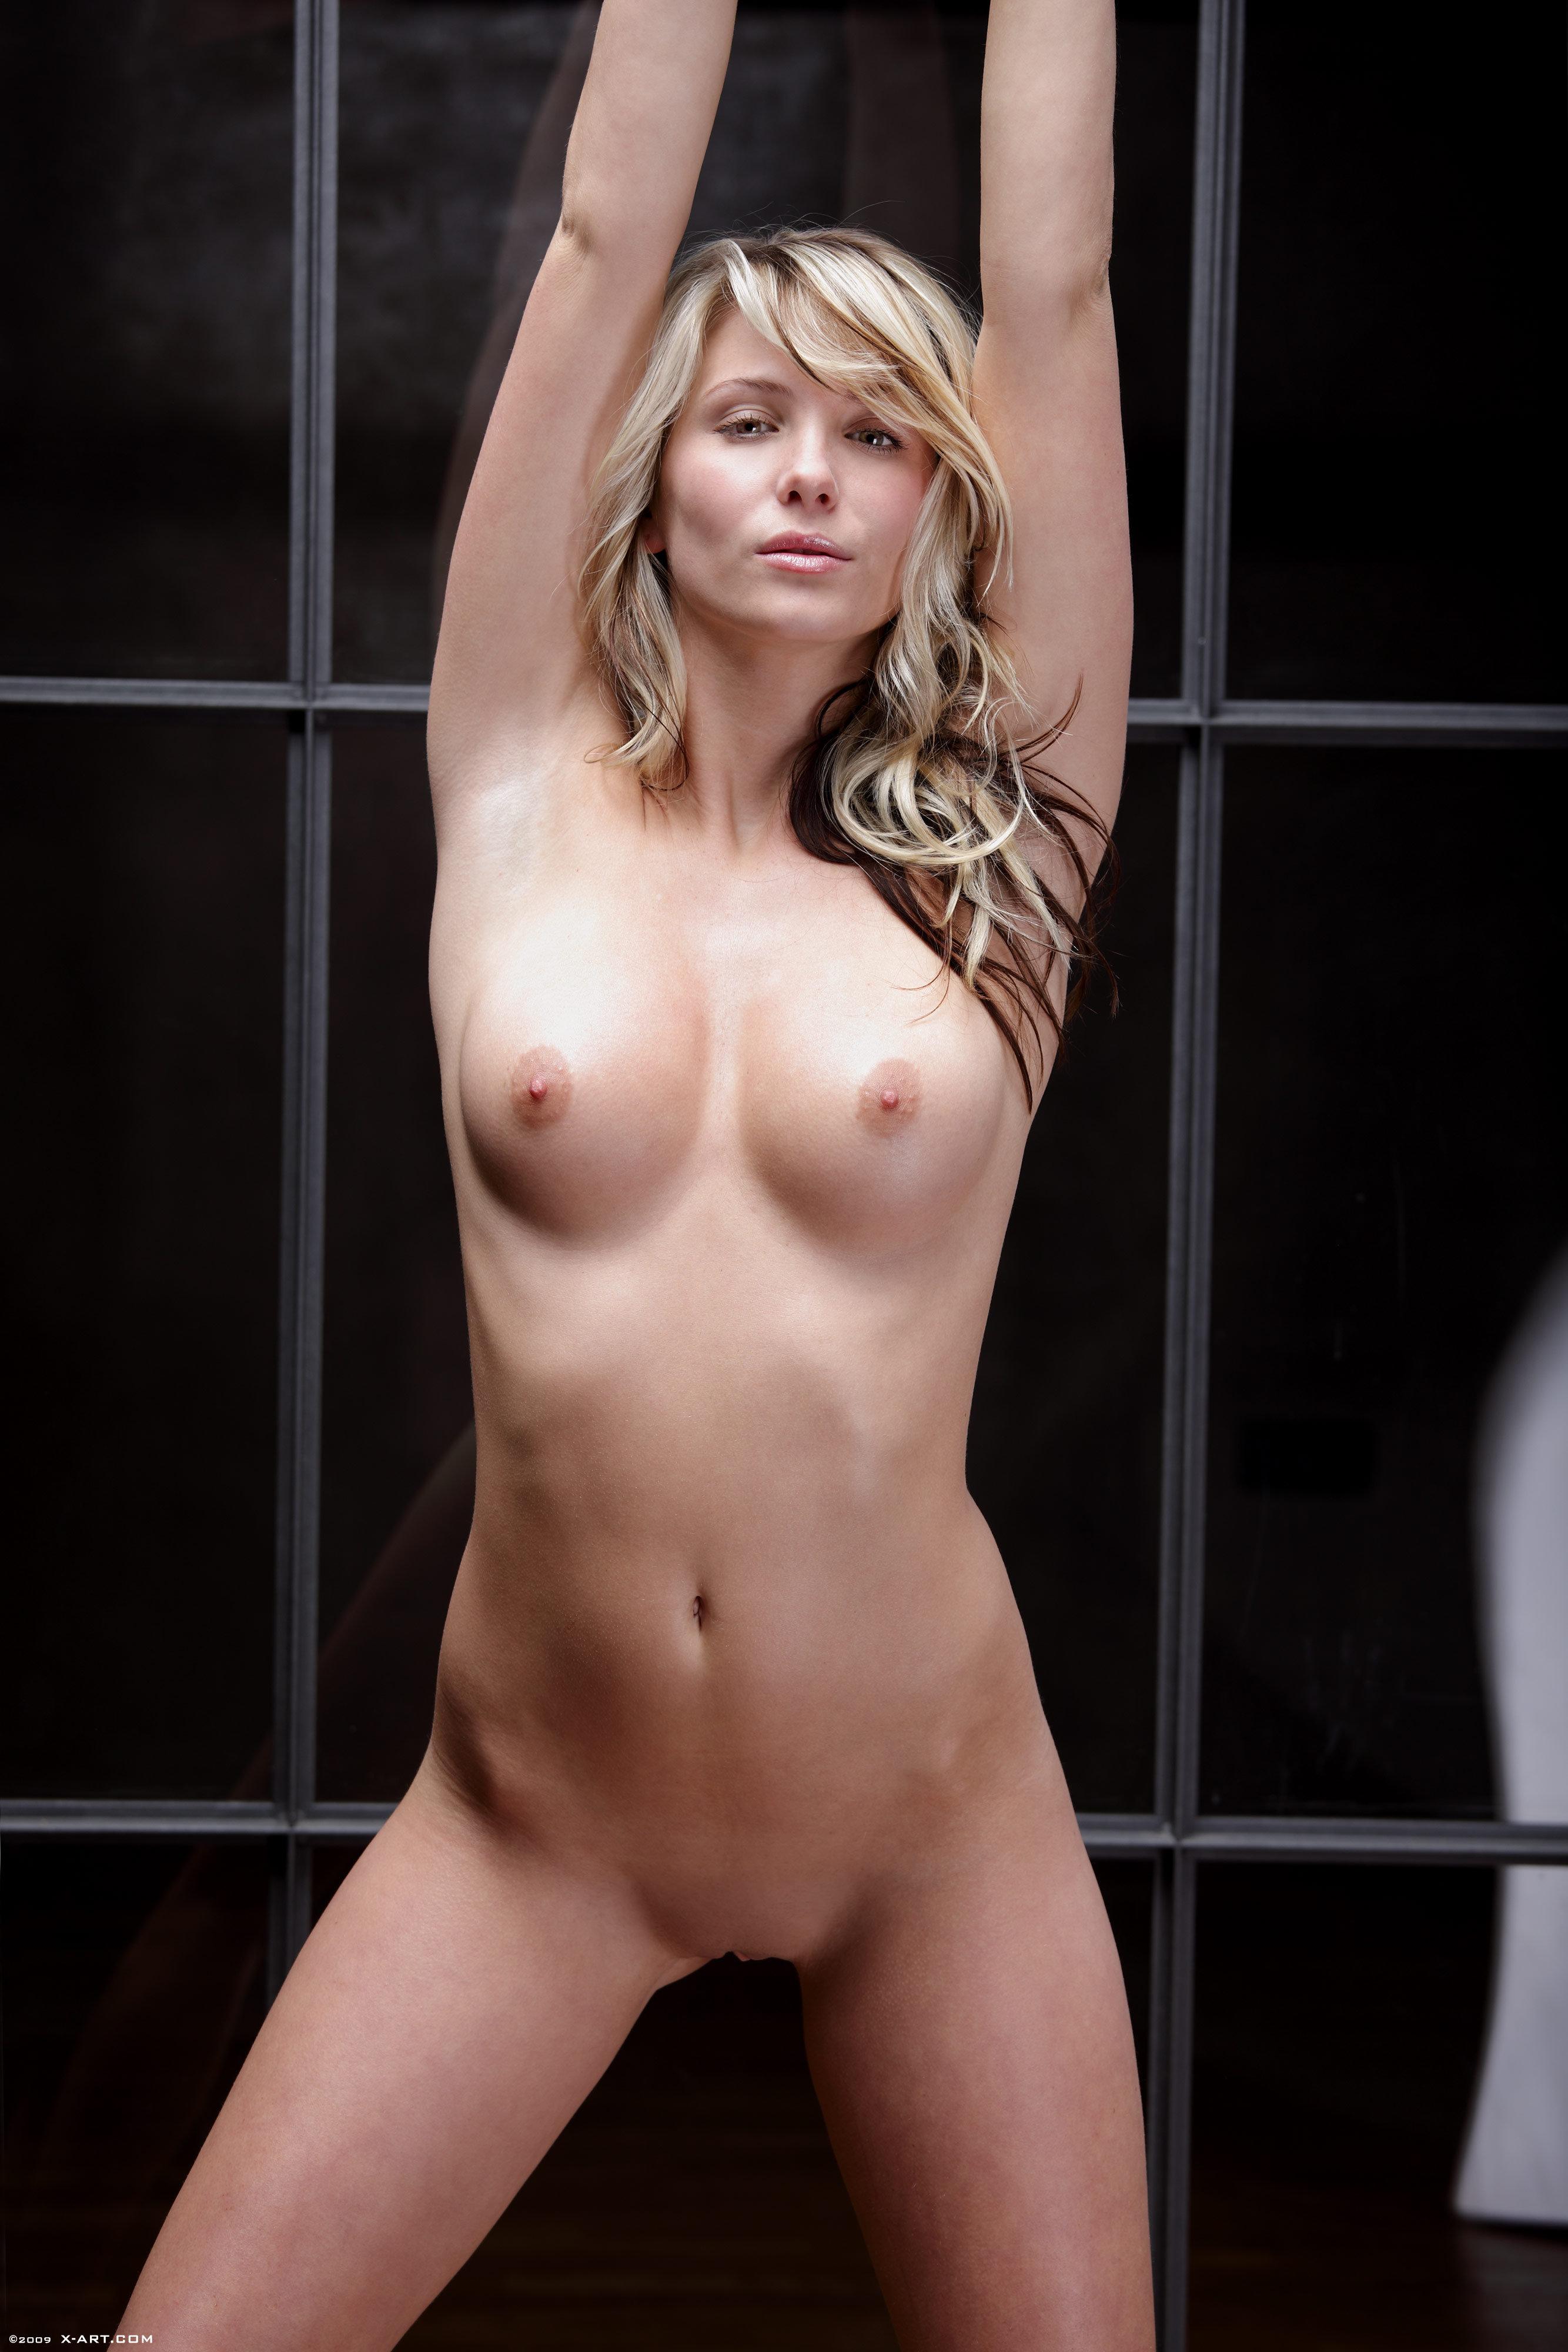 Jennifer nettles bikini photos